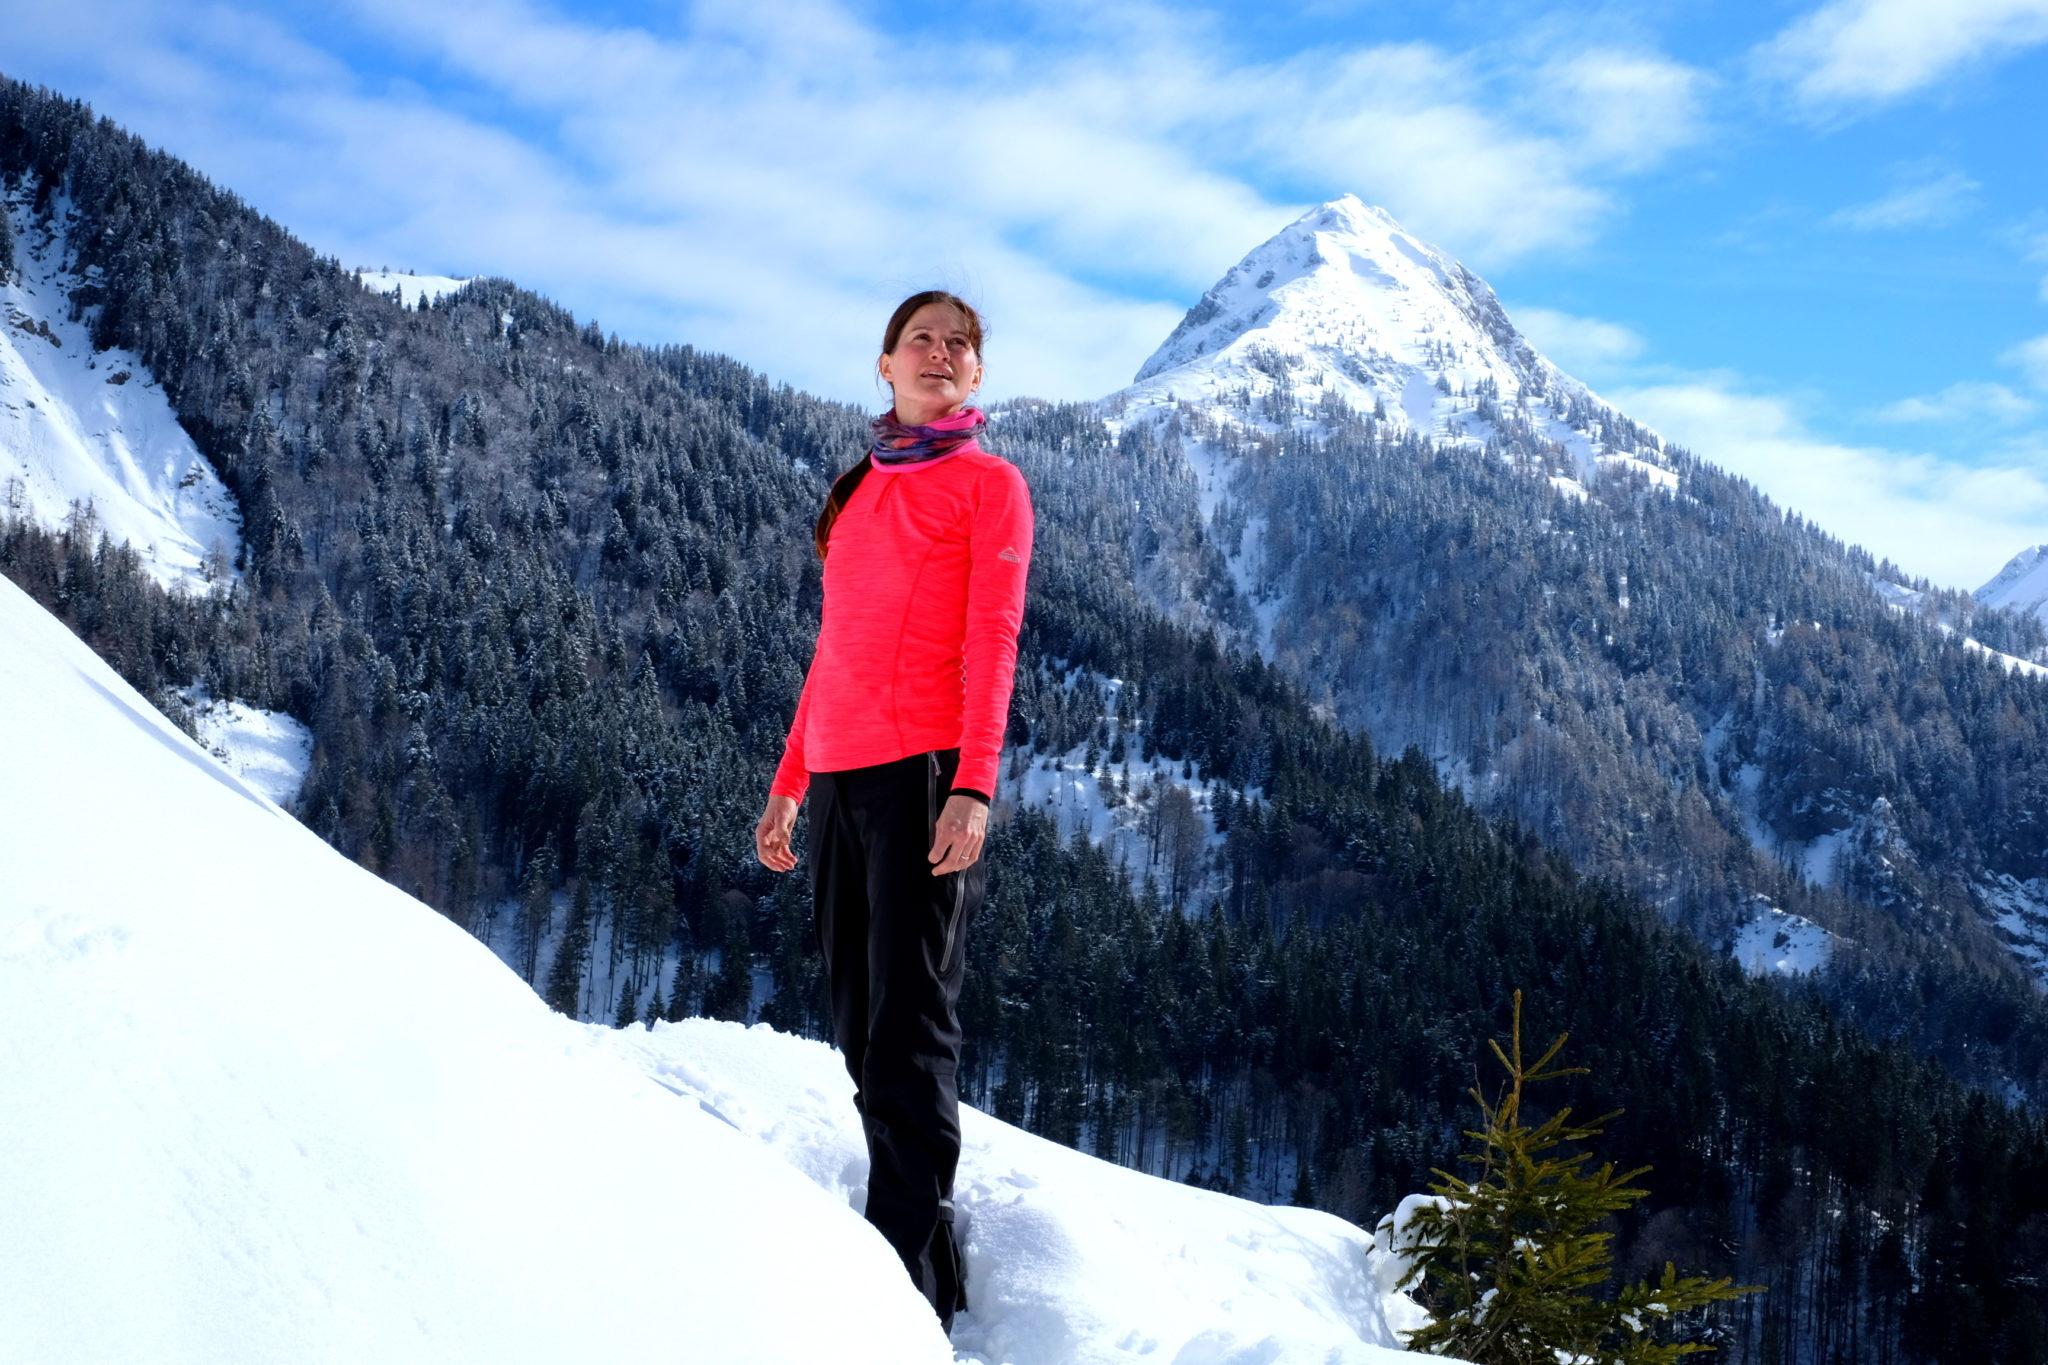 Mt. Košutica in the background.